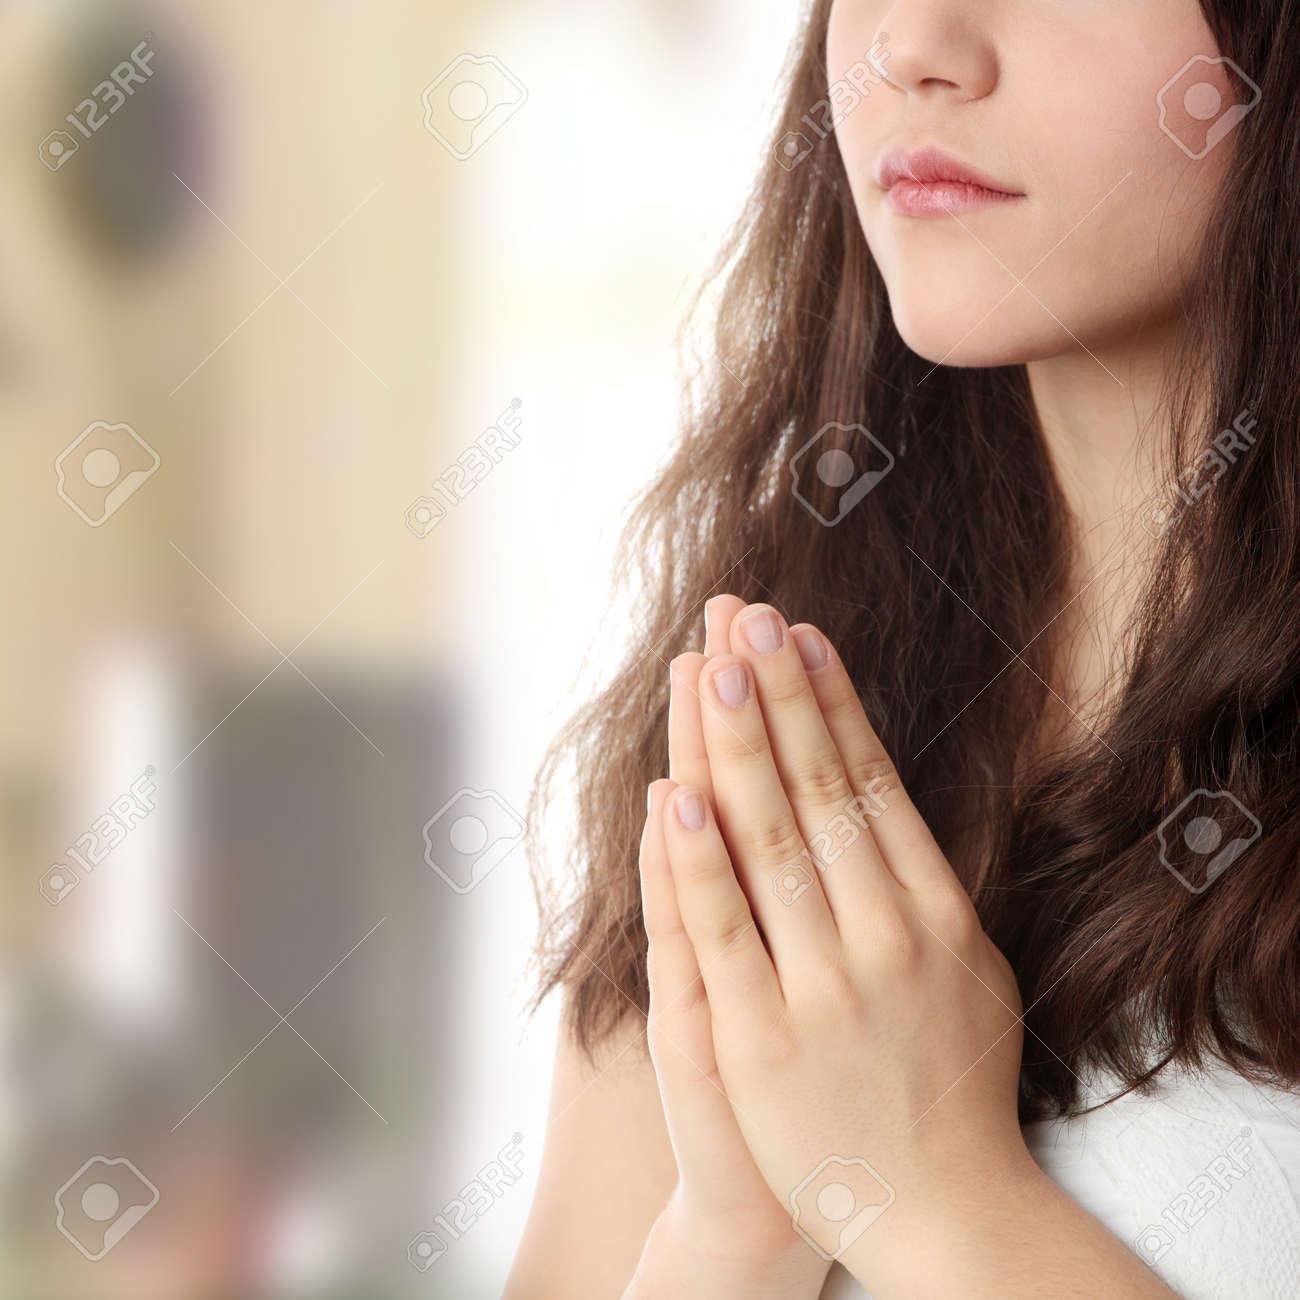 Closeup portrait of a young caucasian woman praying Stock Photo - 6932677